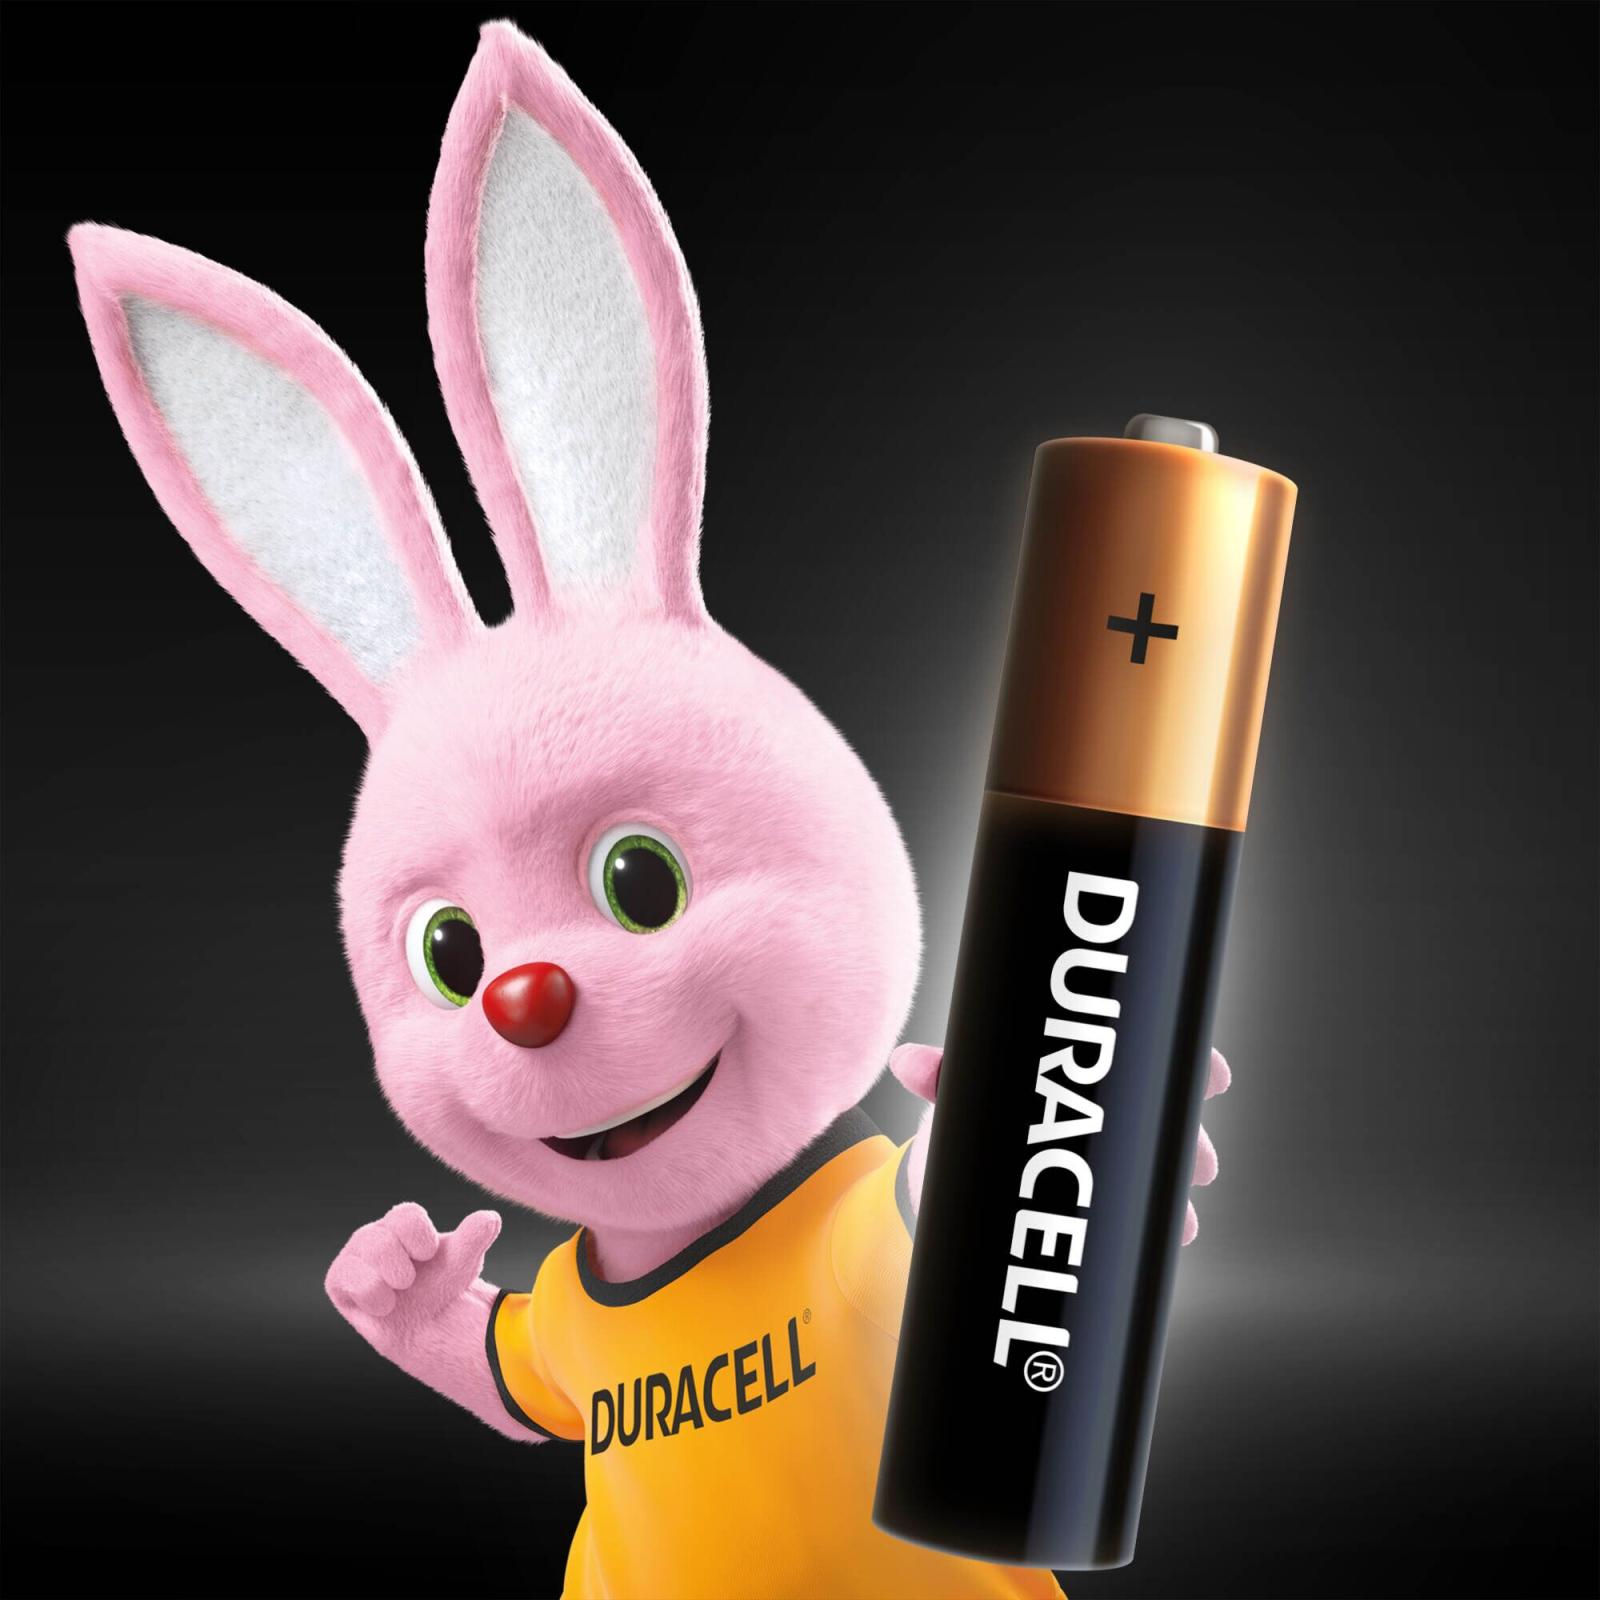 Батарейка AAA MN2400 LR03 * 4 Duracell (5000394052543 / 81545421) изображение 3